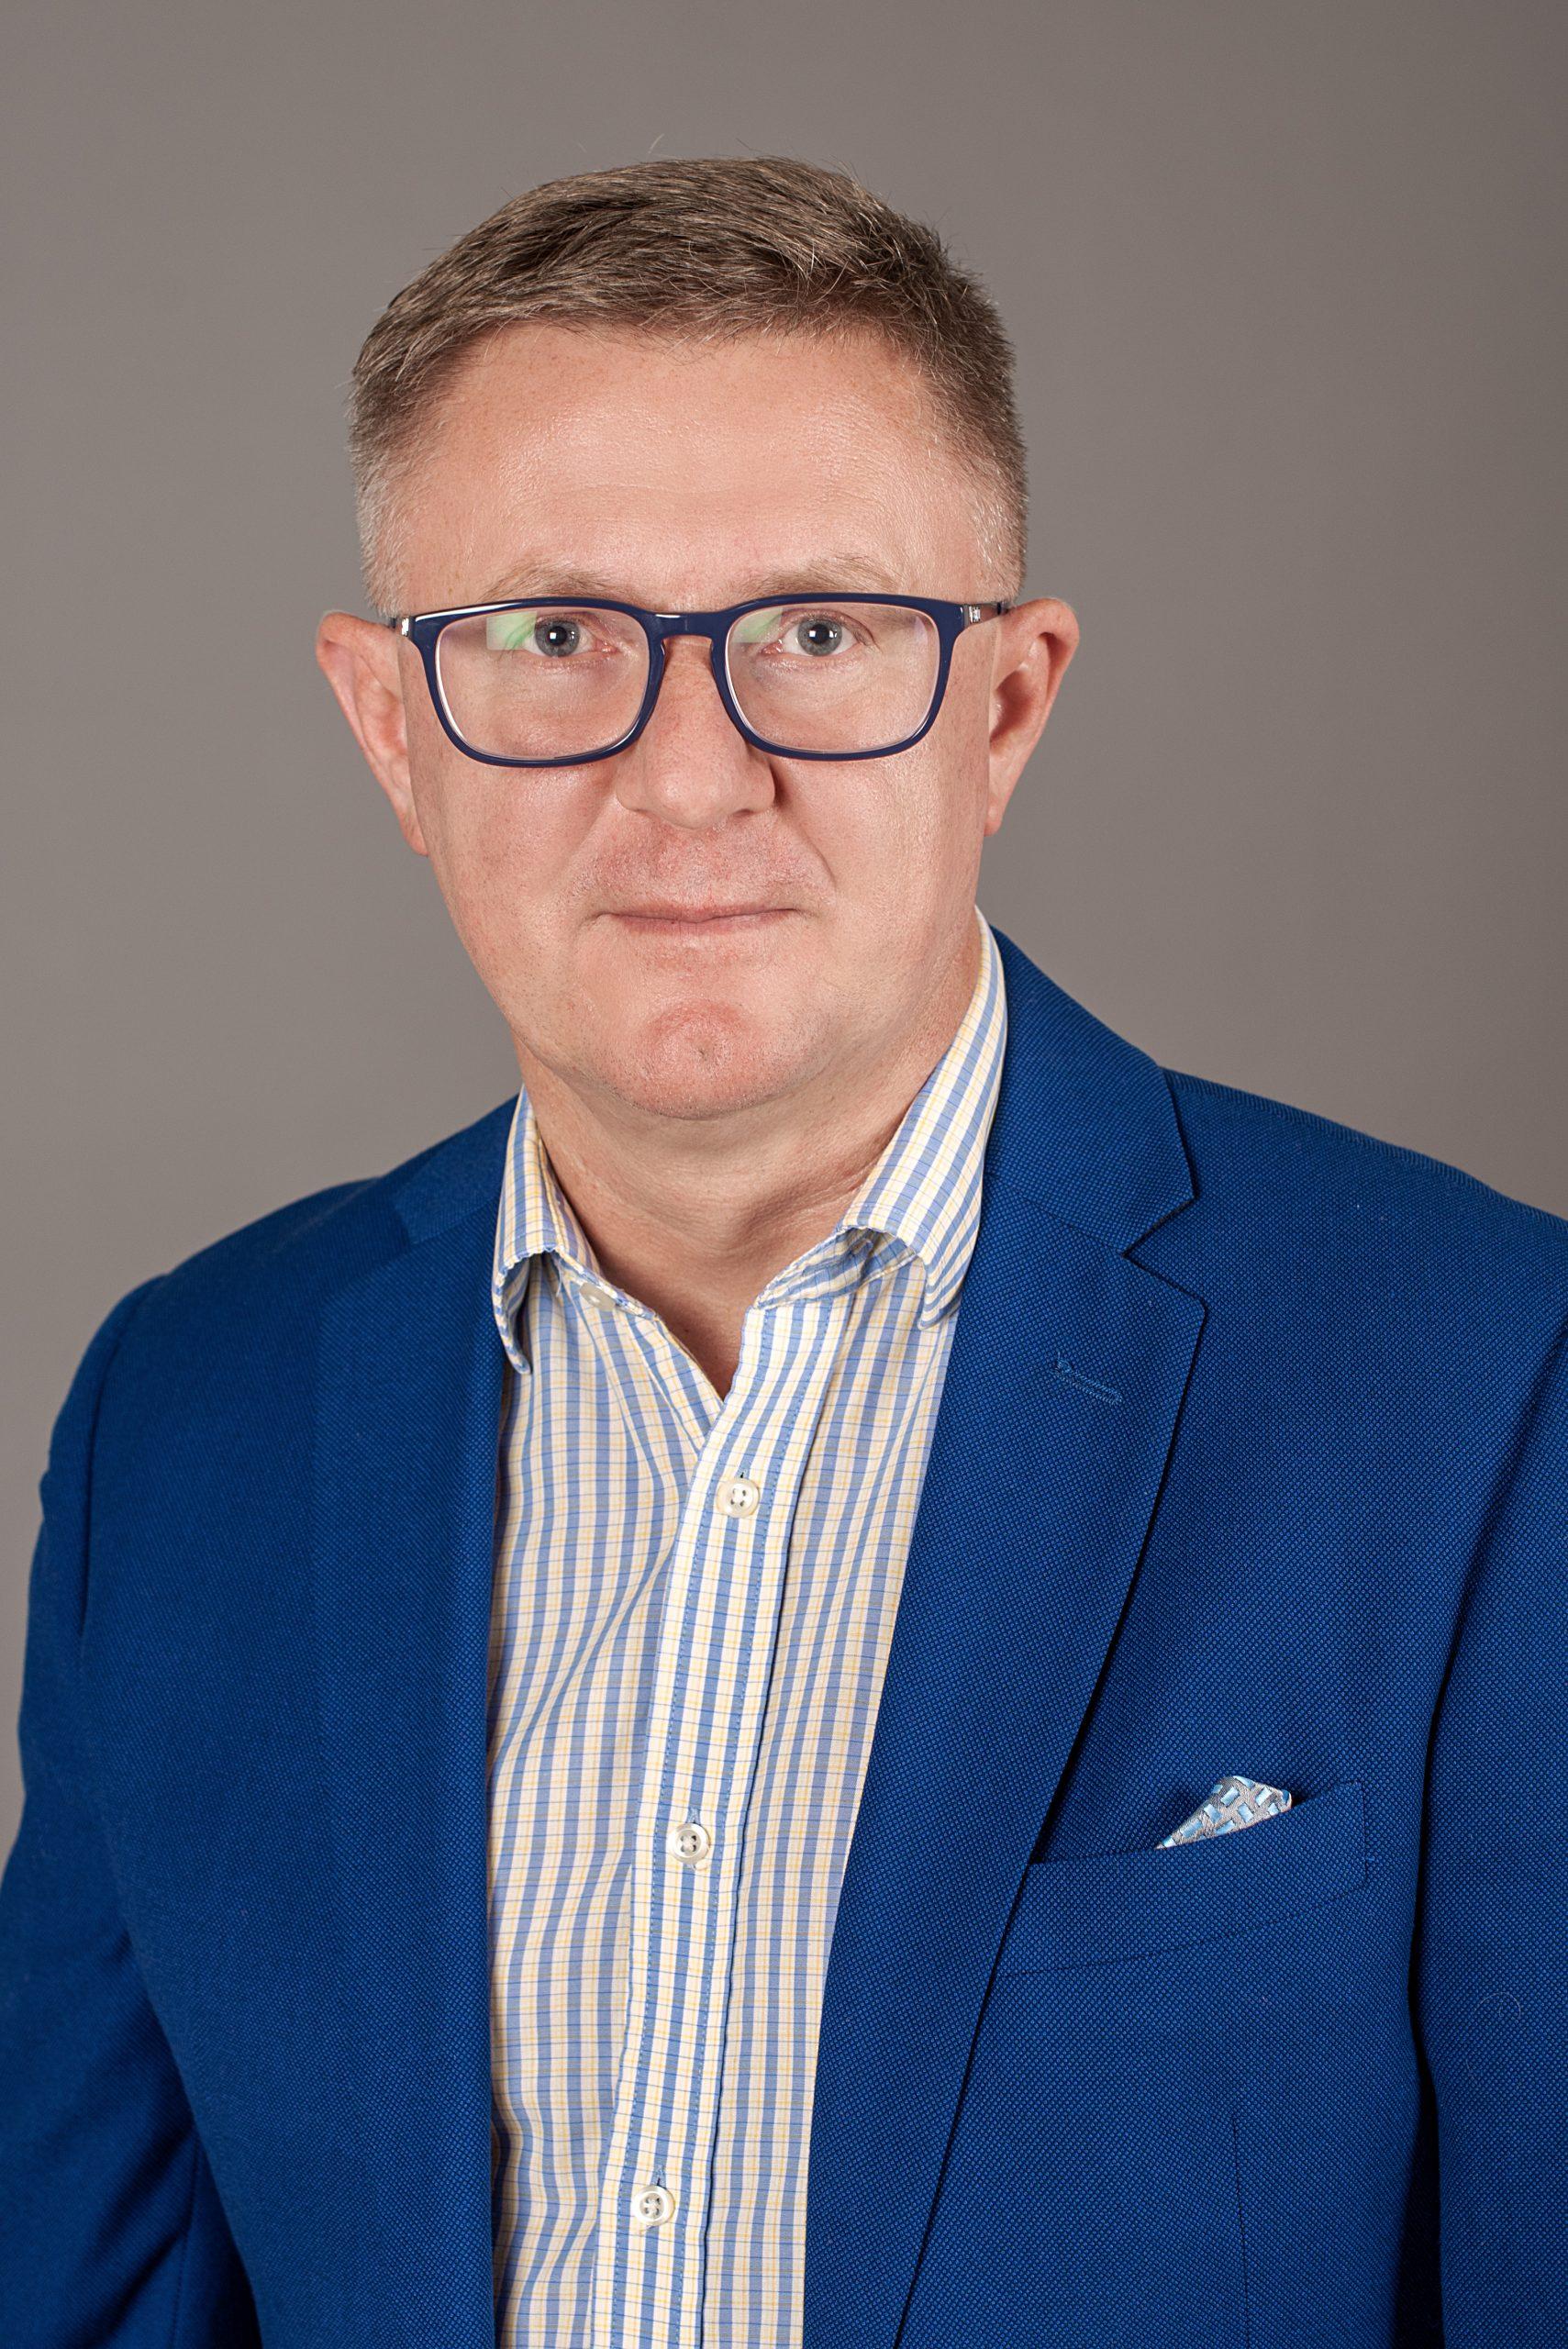 Urologas Kaune